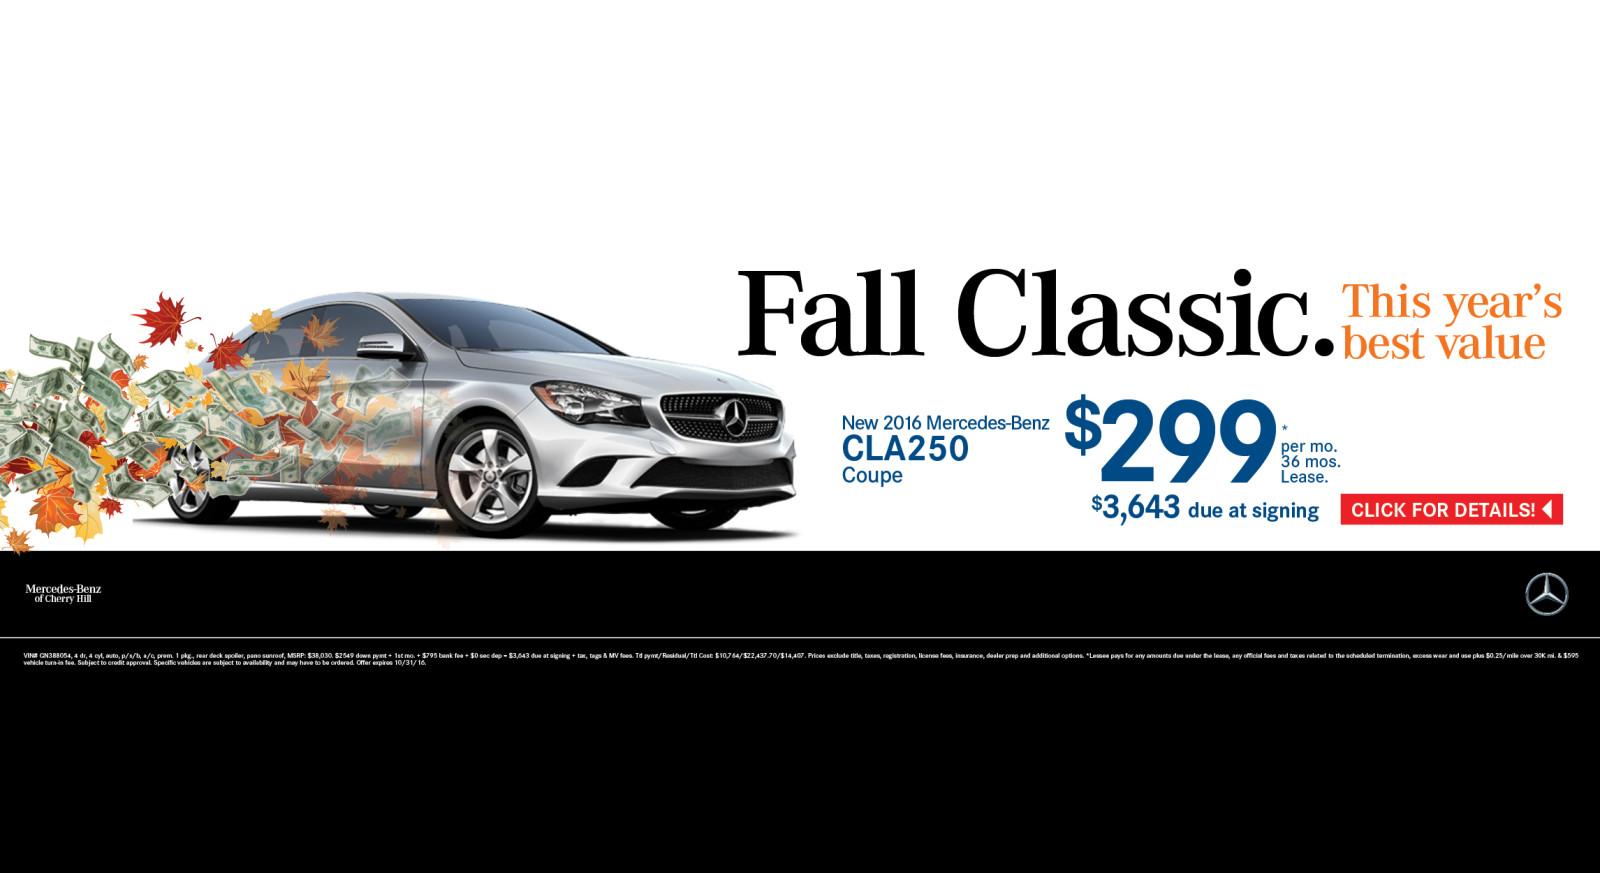 MBCH-1636 Fall Classic 2500x1250 Slide_CLA250